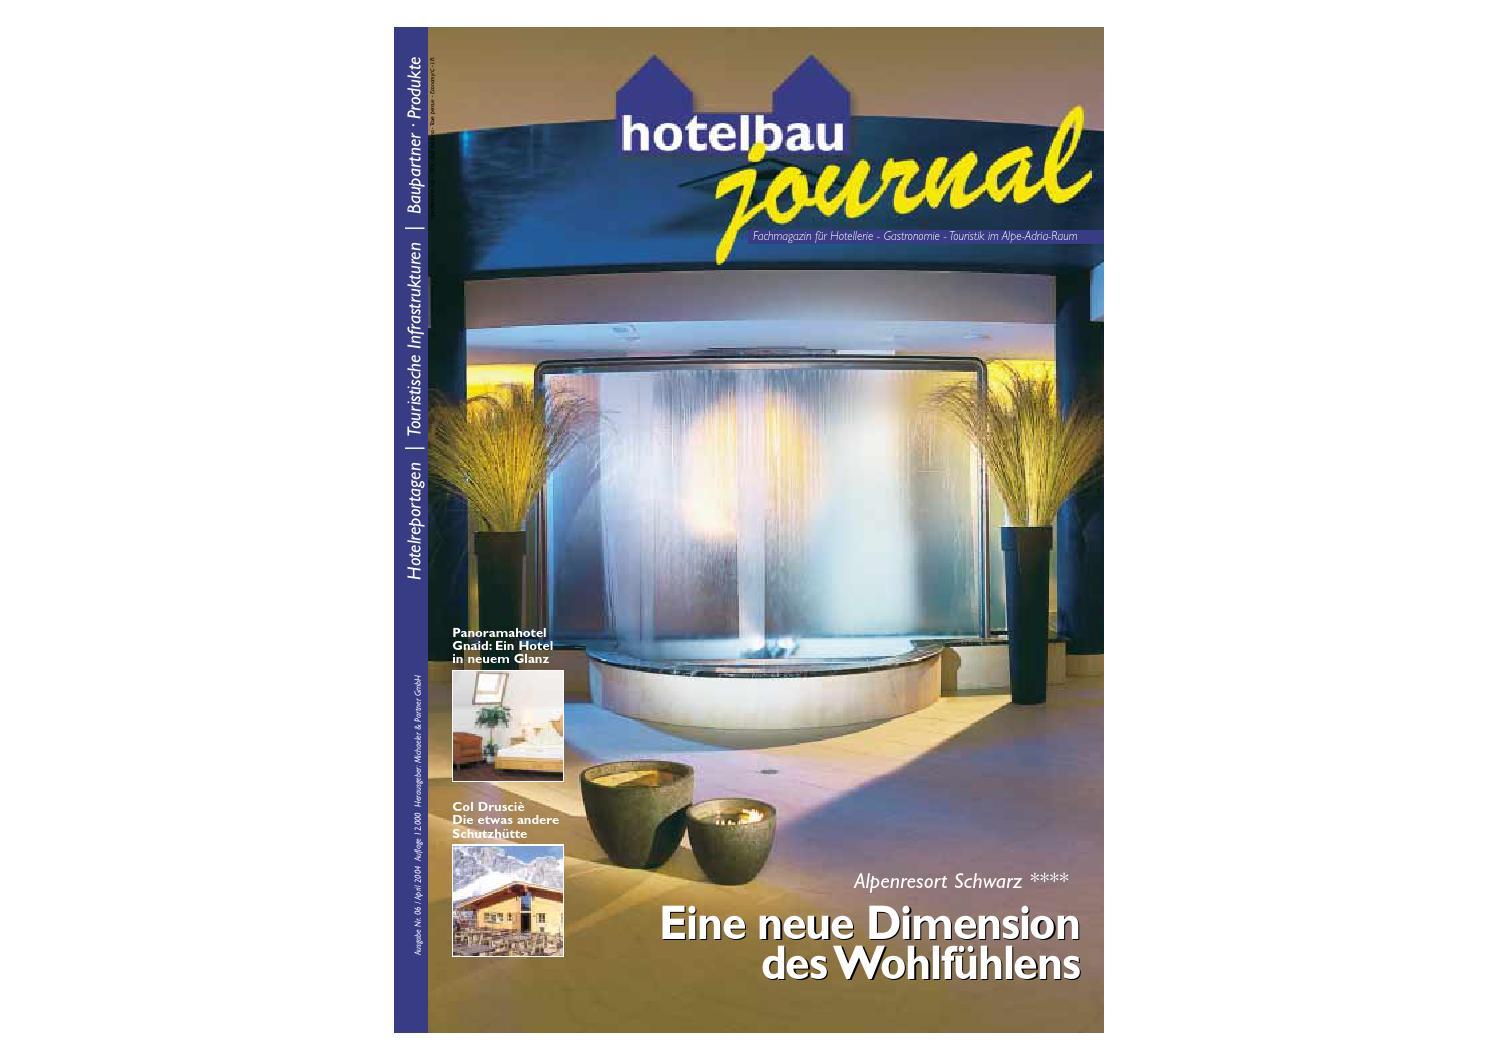 Hotelbau journal 06 de by Michaeler & Partner - issuu